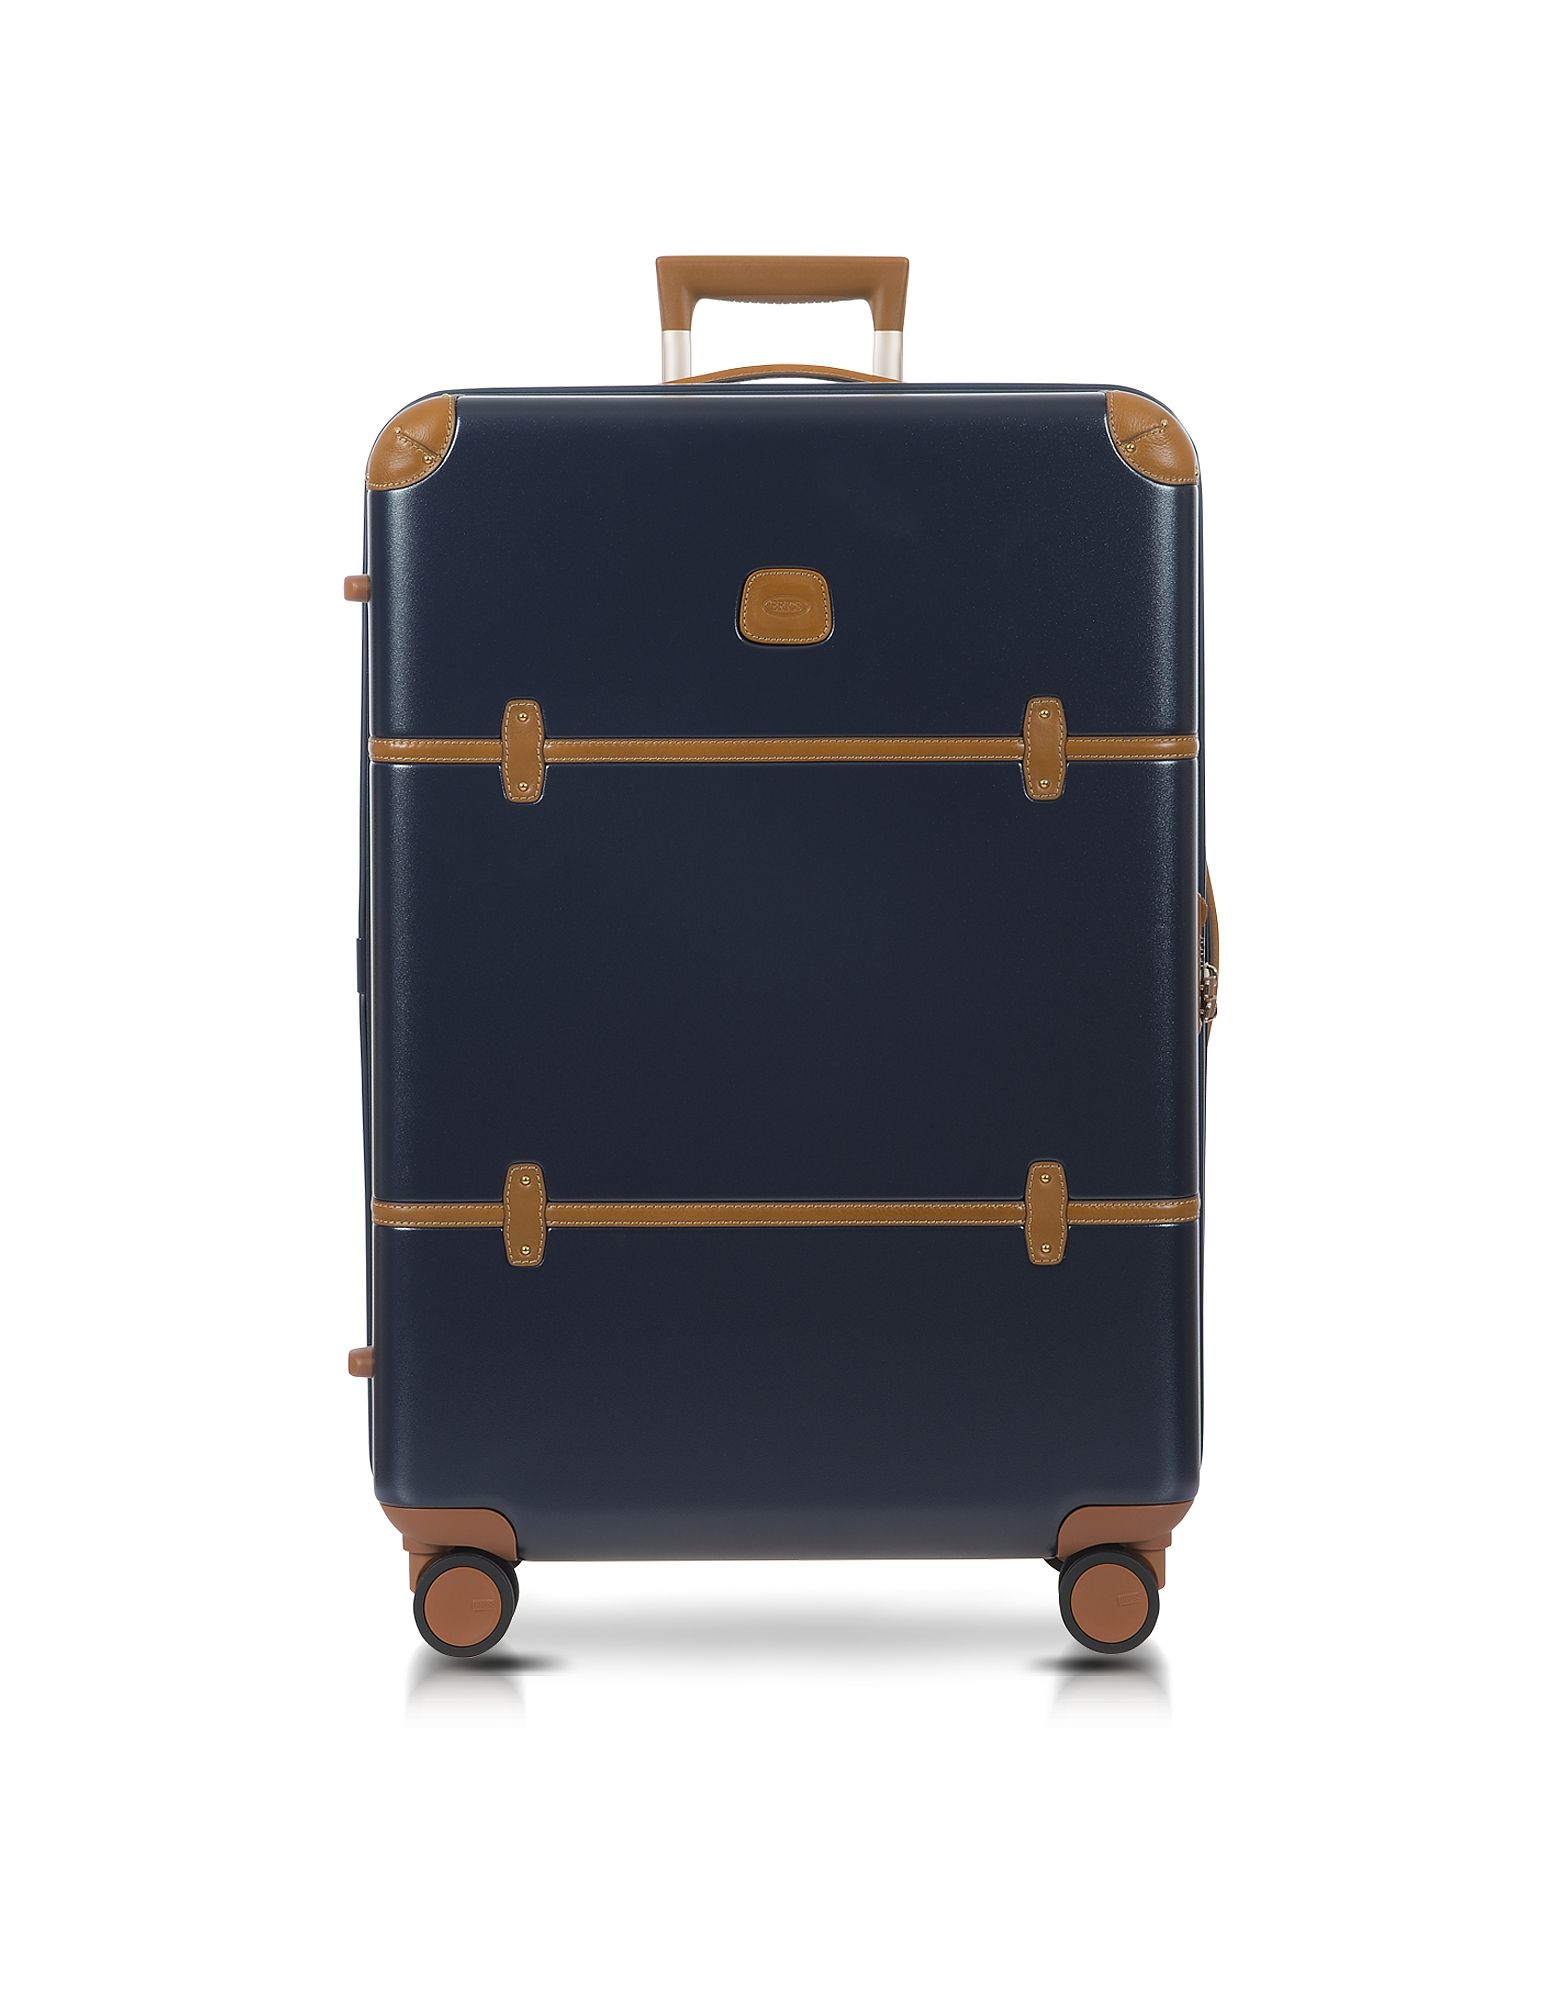 Bellagio V2.0 - Синий и Табачный Чемодан 30? на Колесиках